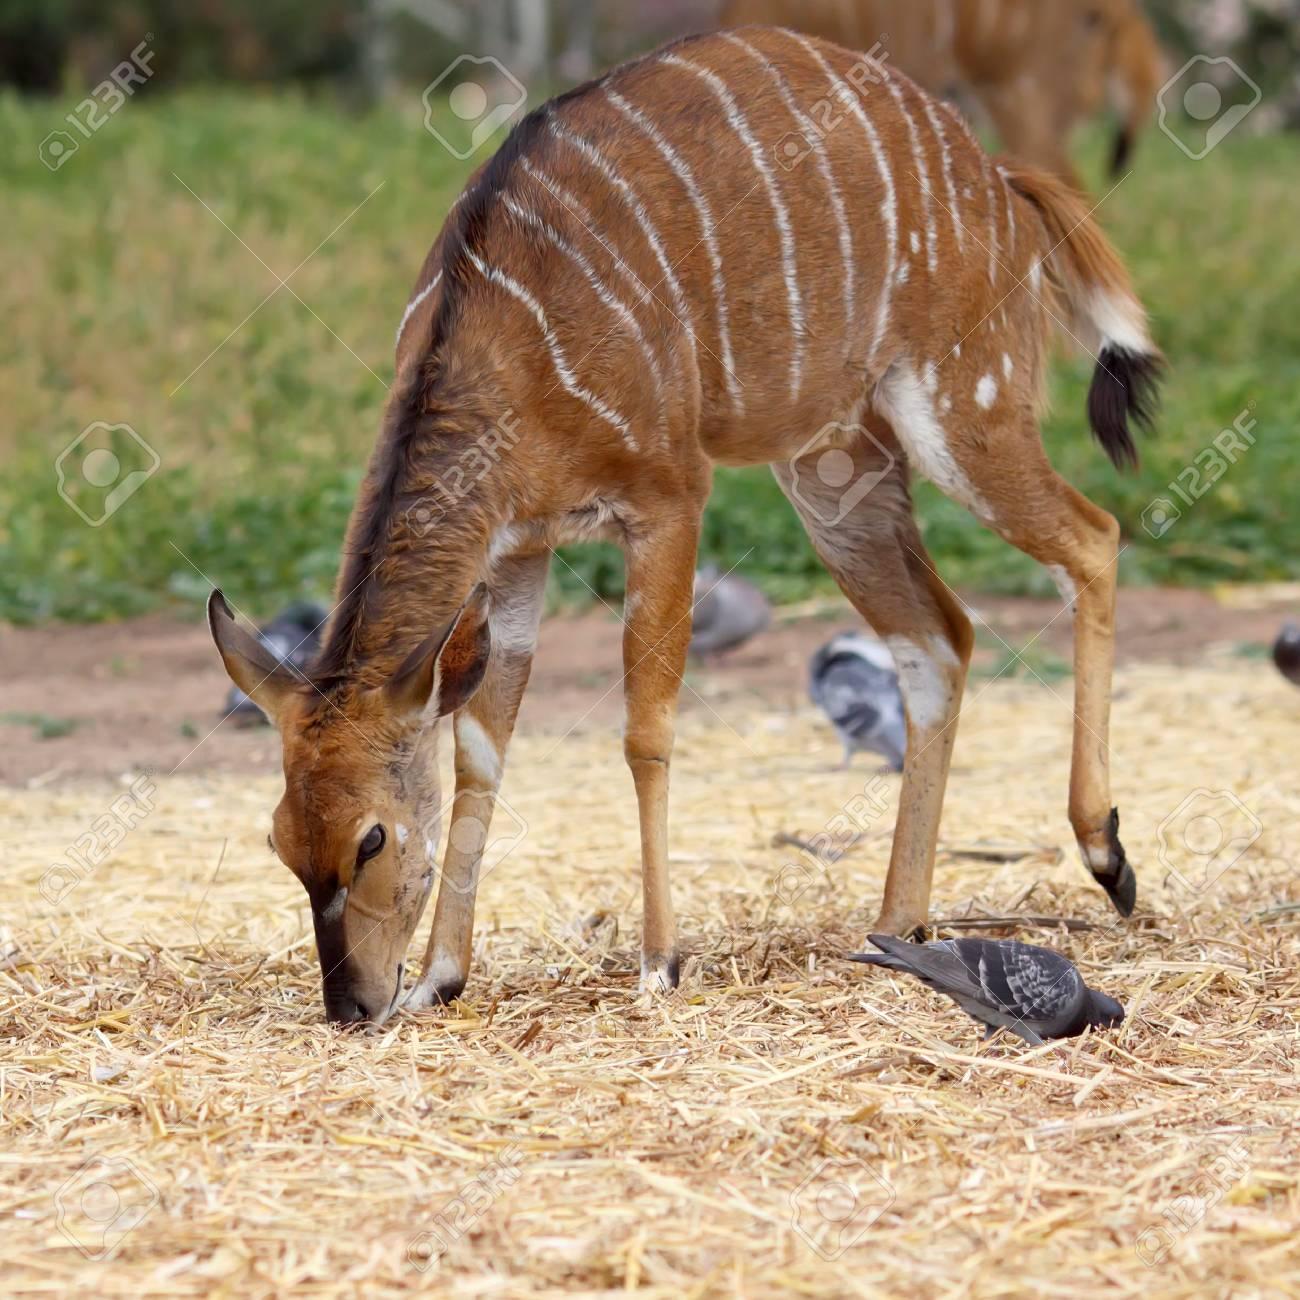 female antelope kudu feeding on the grass Stock Photo - 15857460